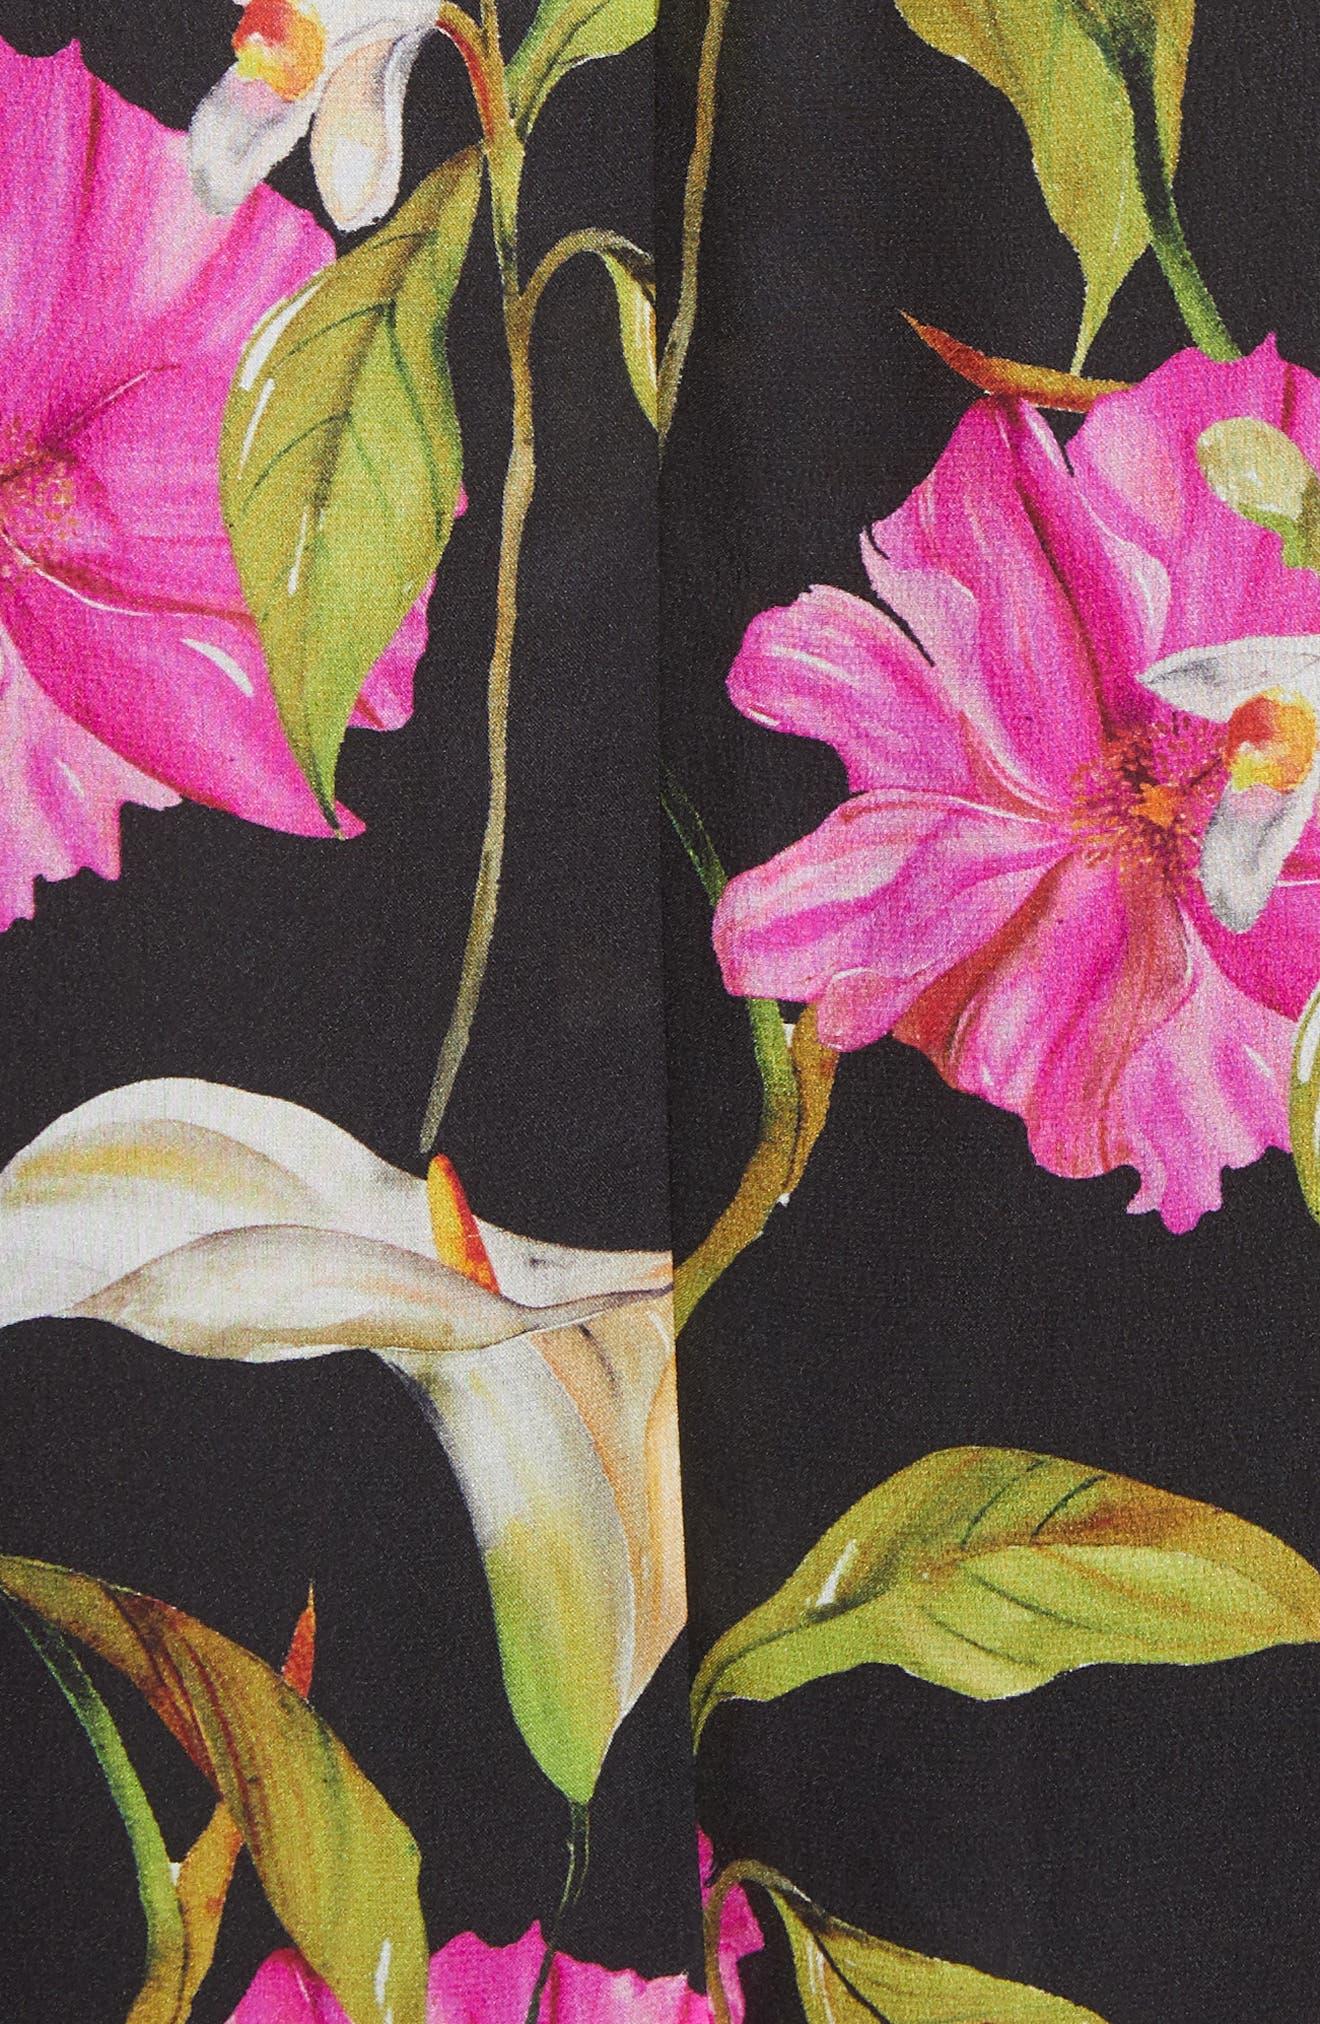 Jill Large Calla Lily Shift Dress,                             Alternate thumbnail 5, color,                             004